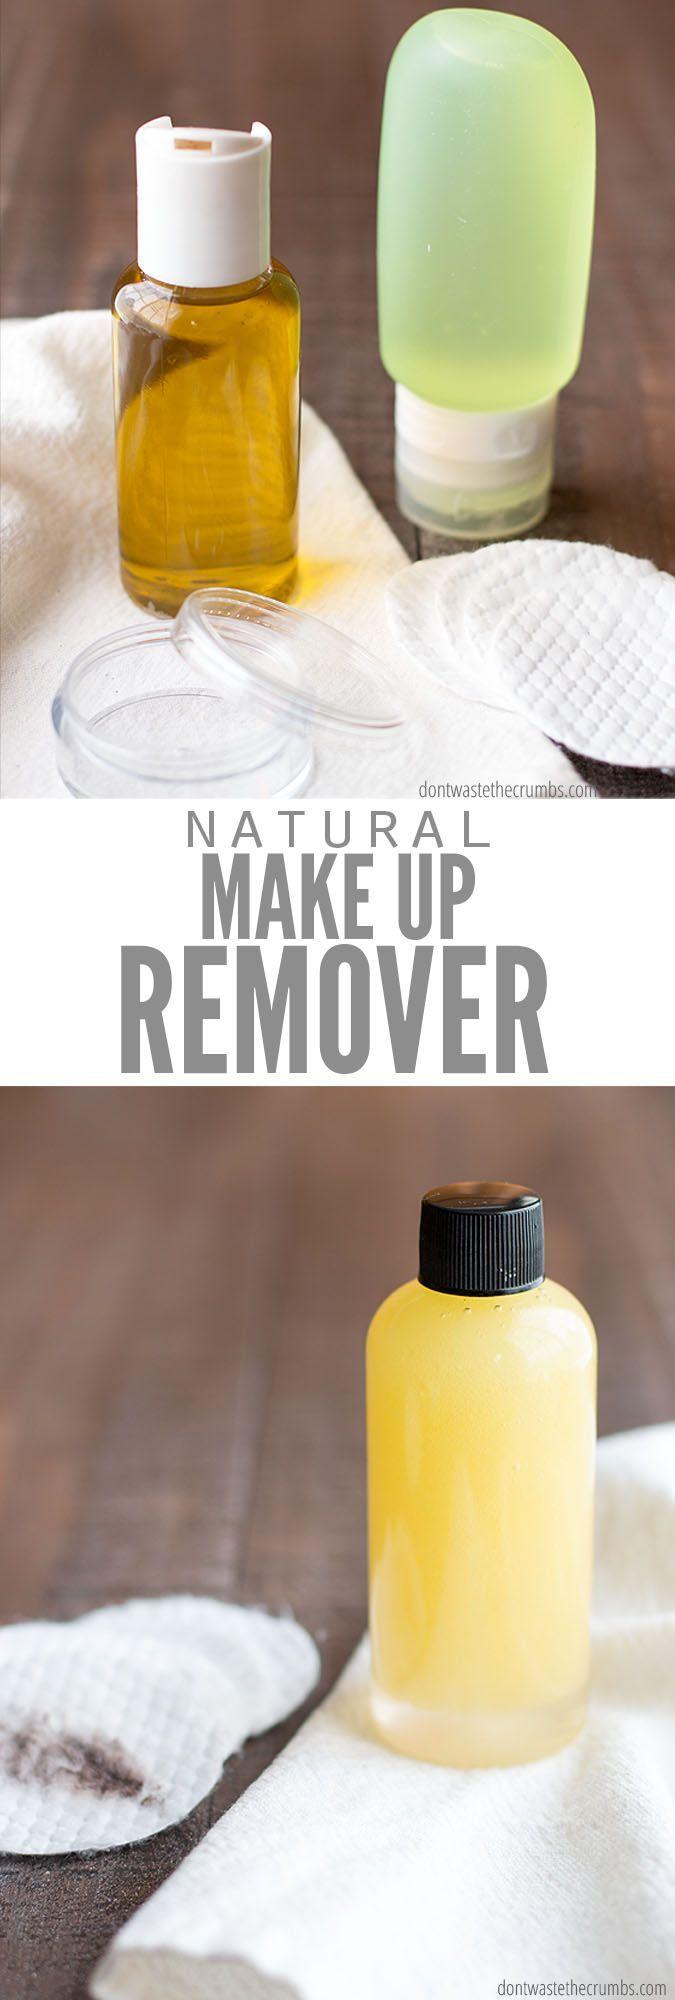 Natural Makeup Remover | 7 methods using just 1 ingredient